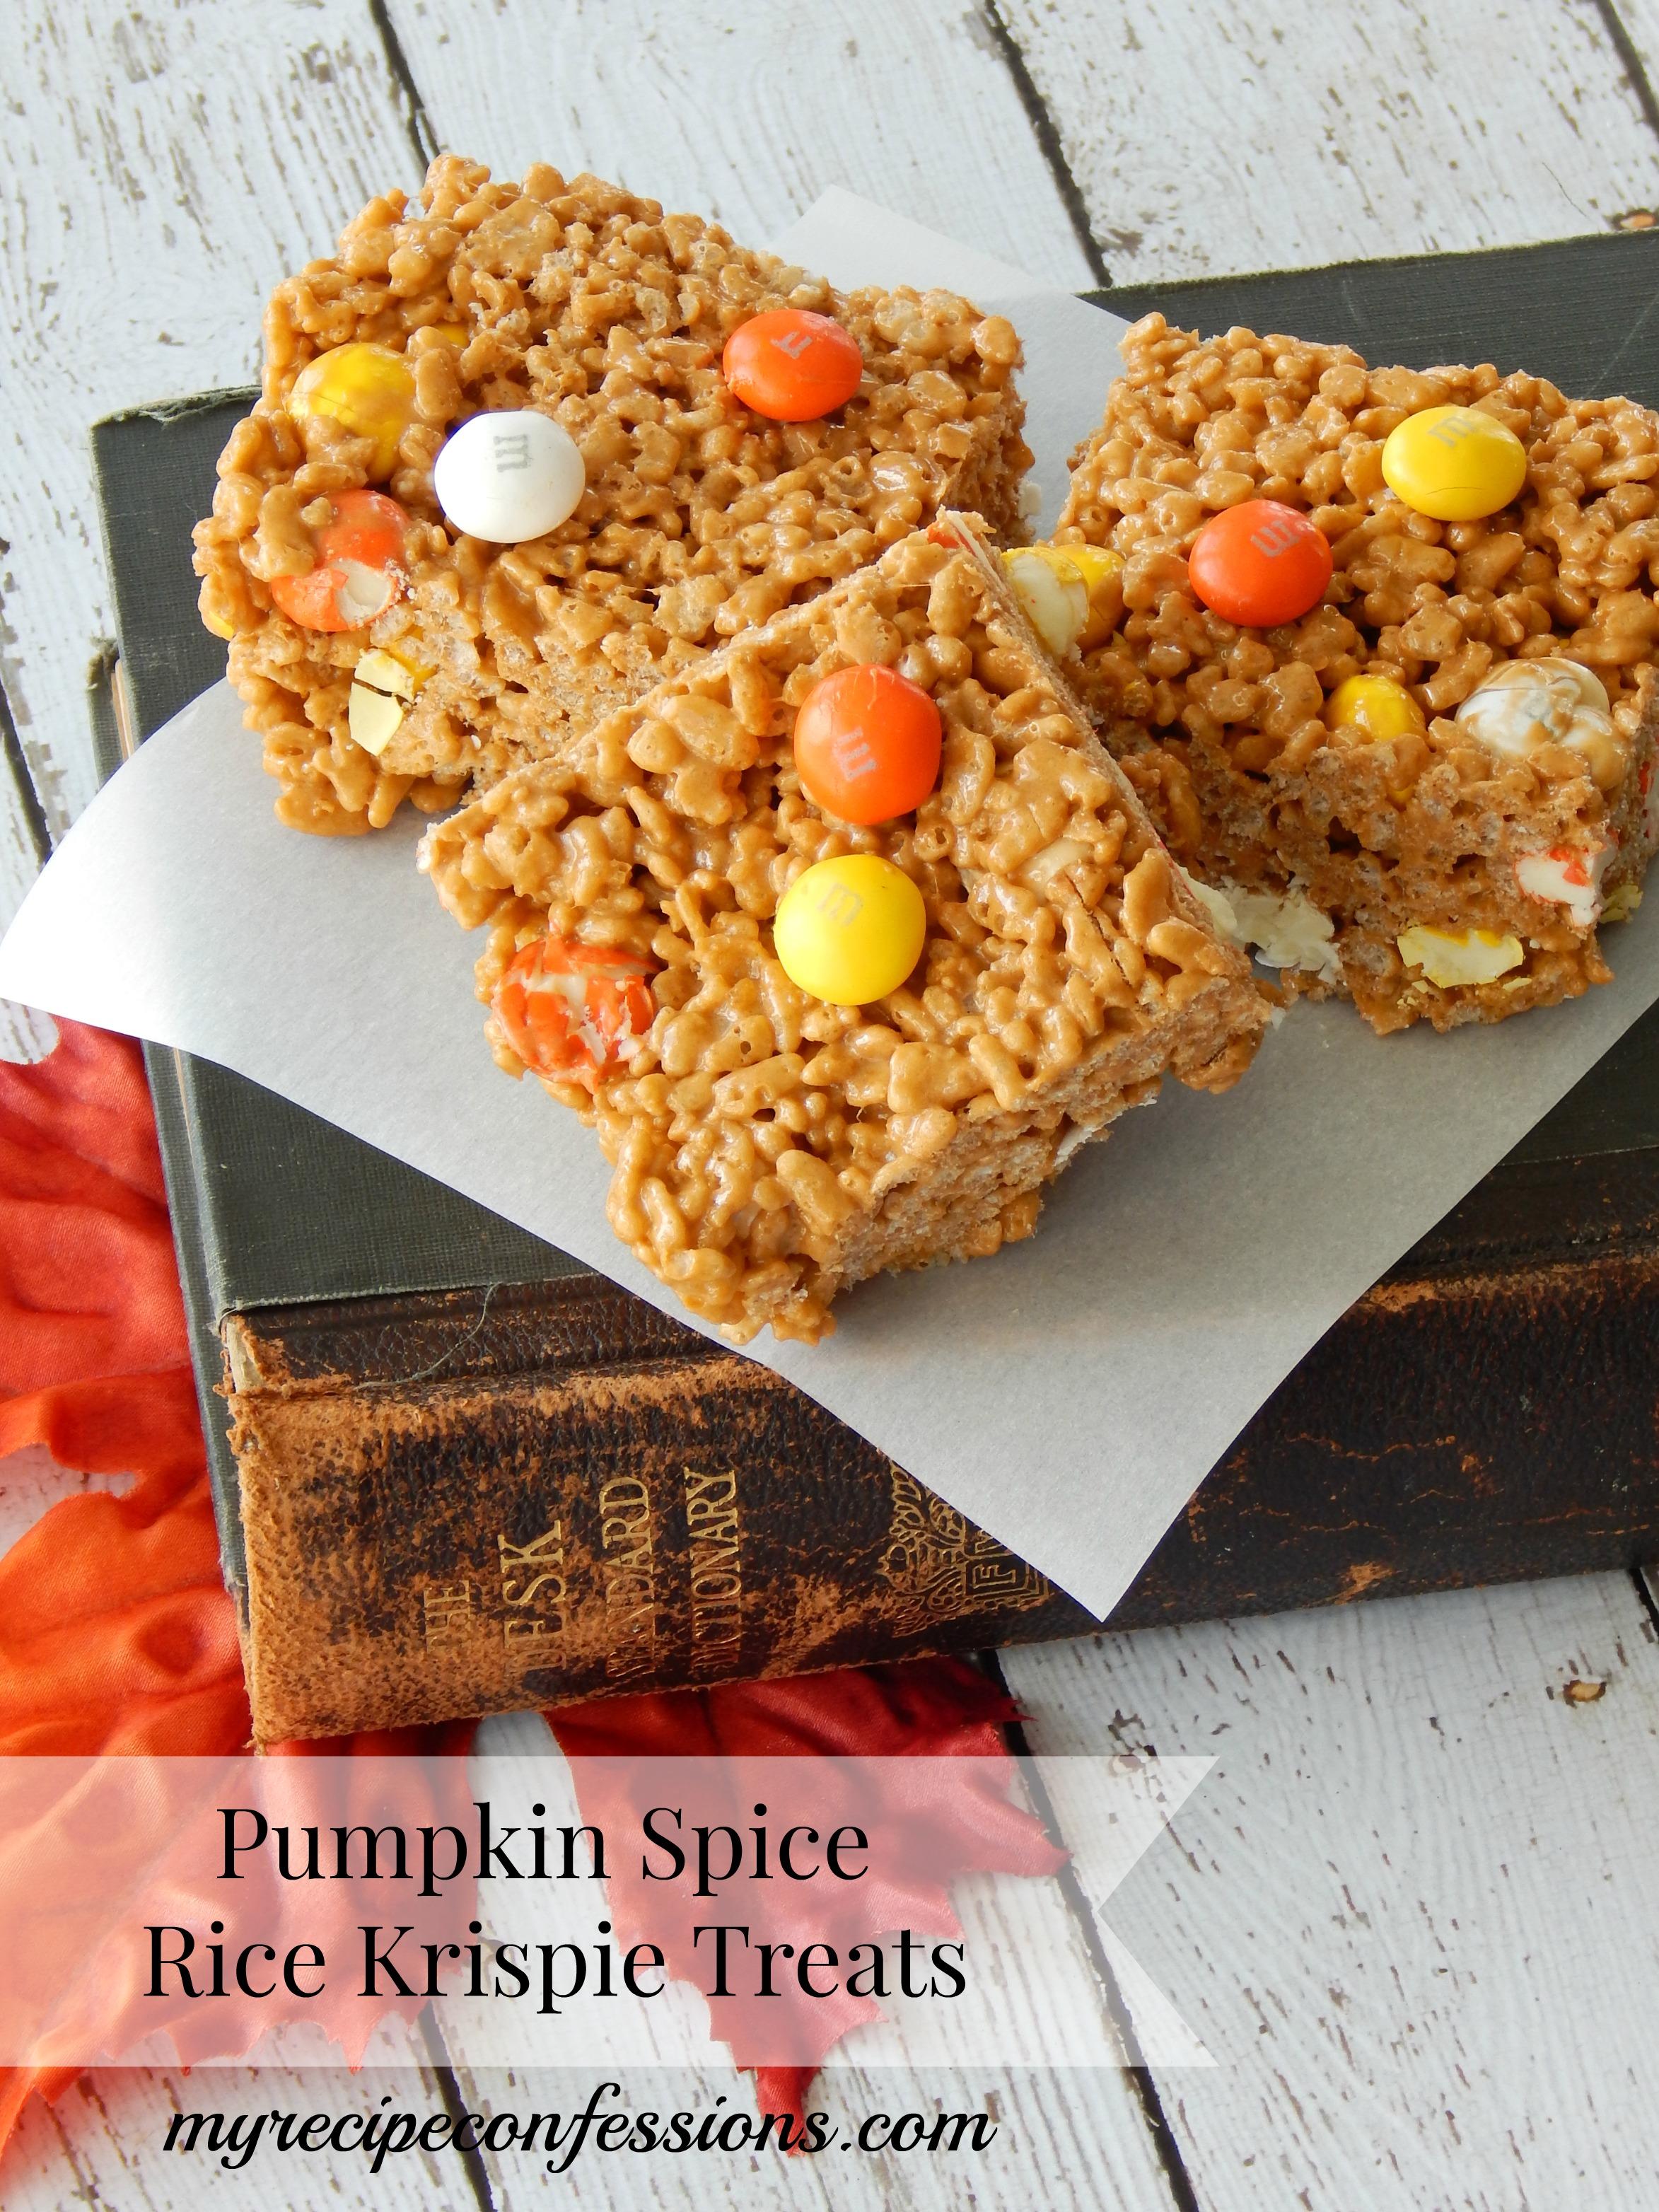 Pumpkin Spice Rice Krispie Treats - My Recipe Confessions